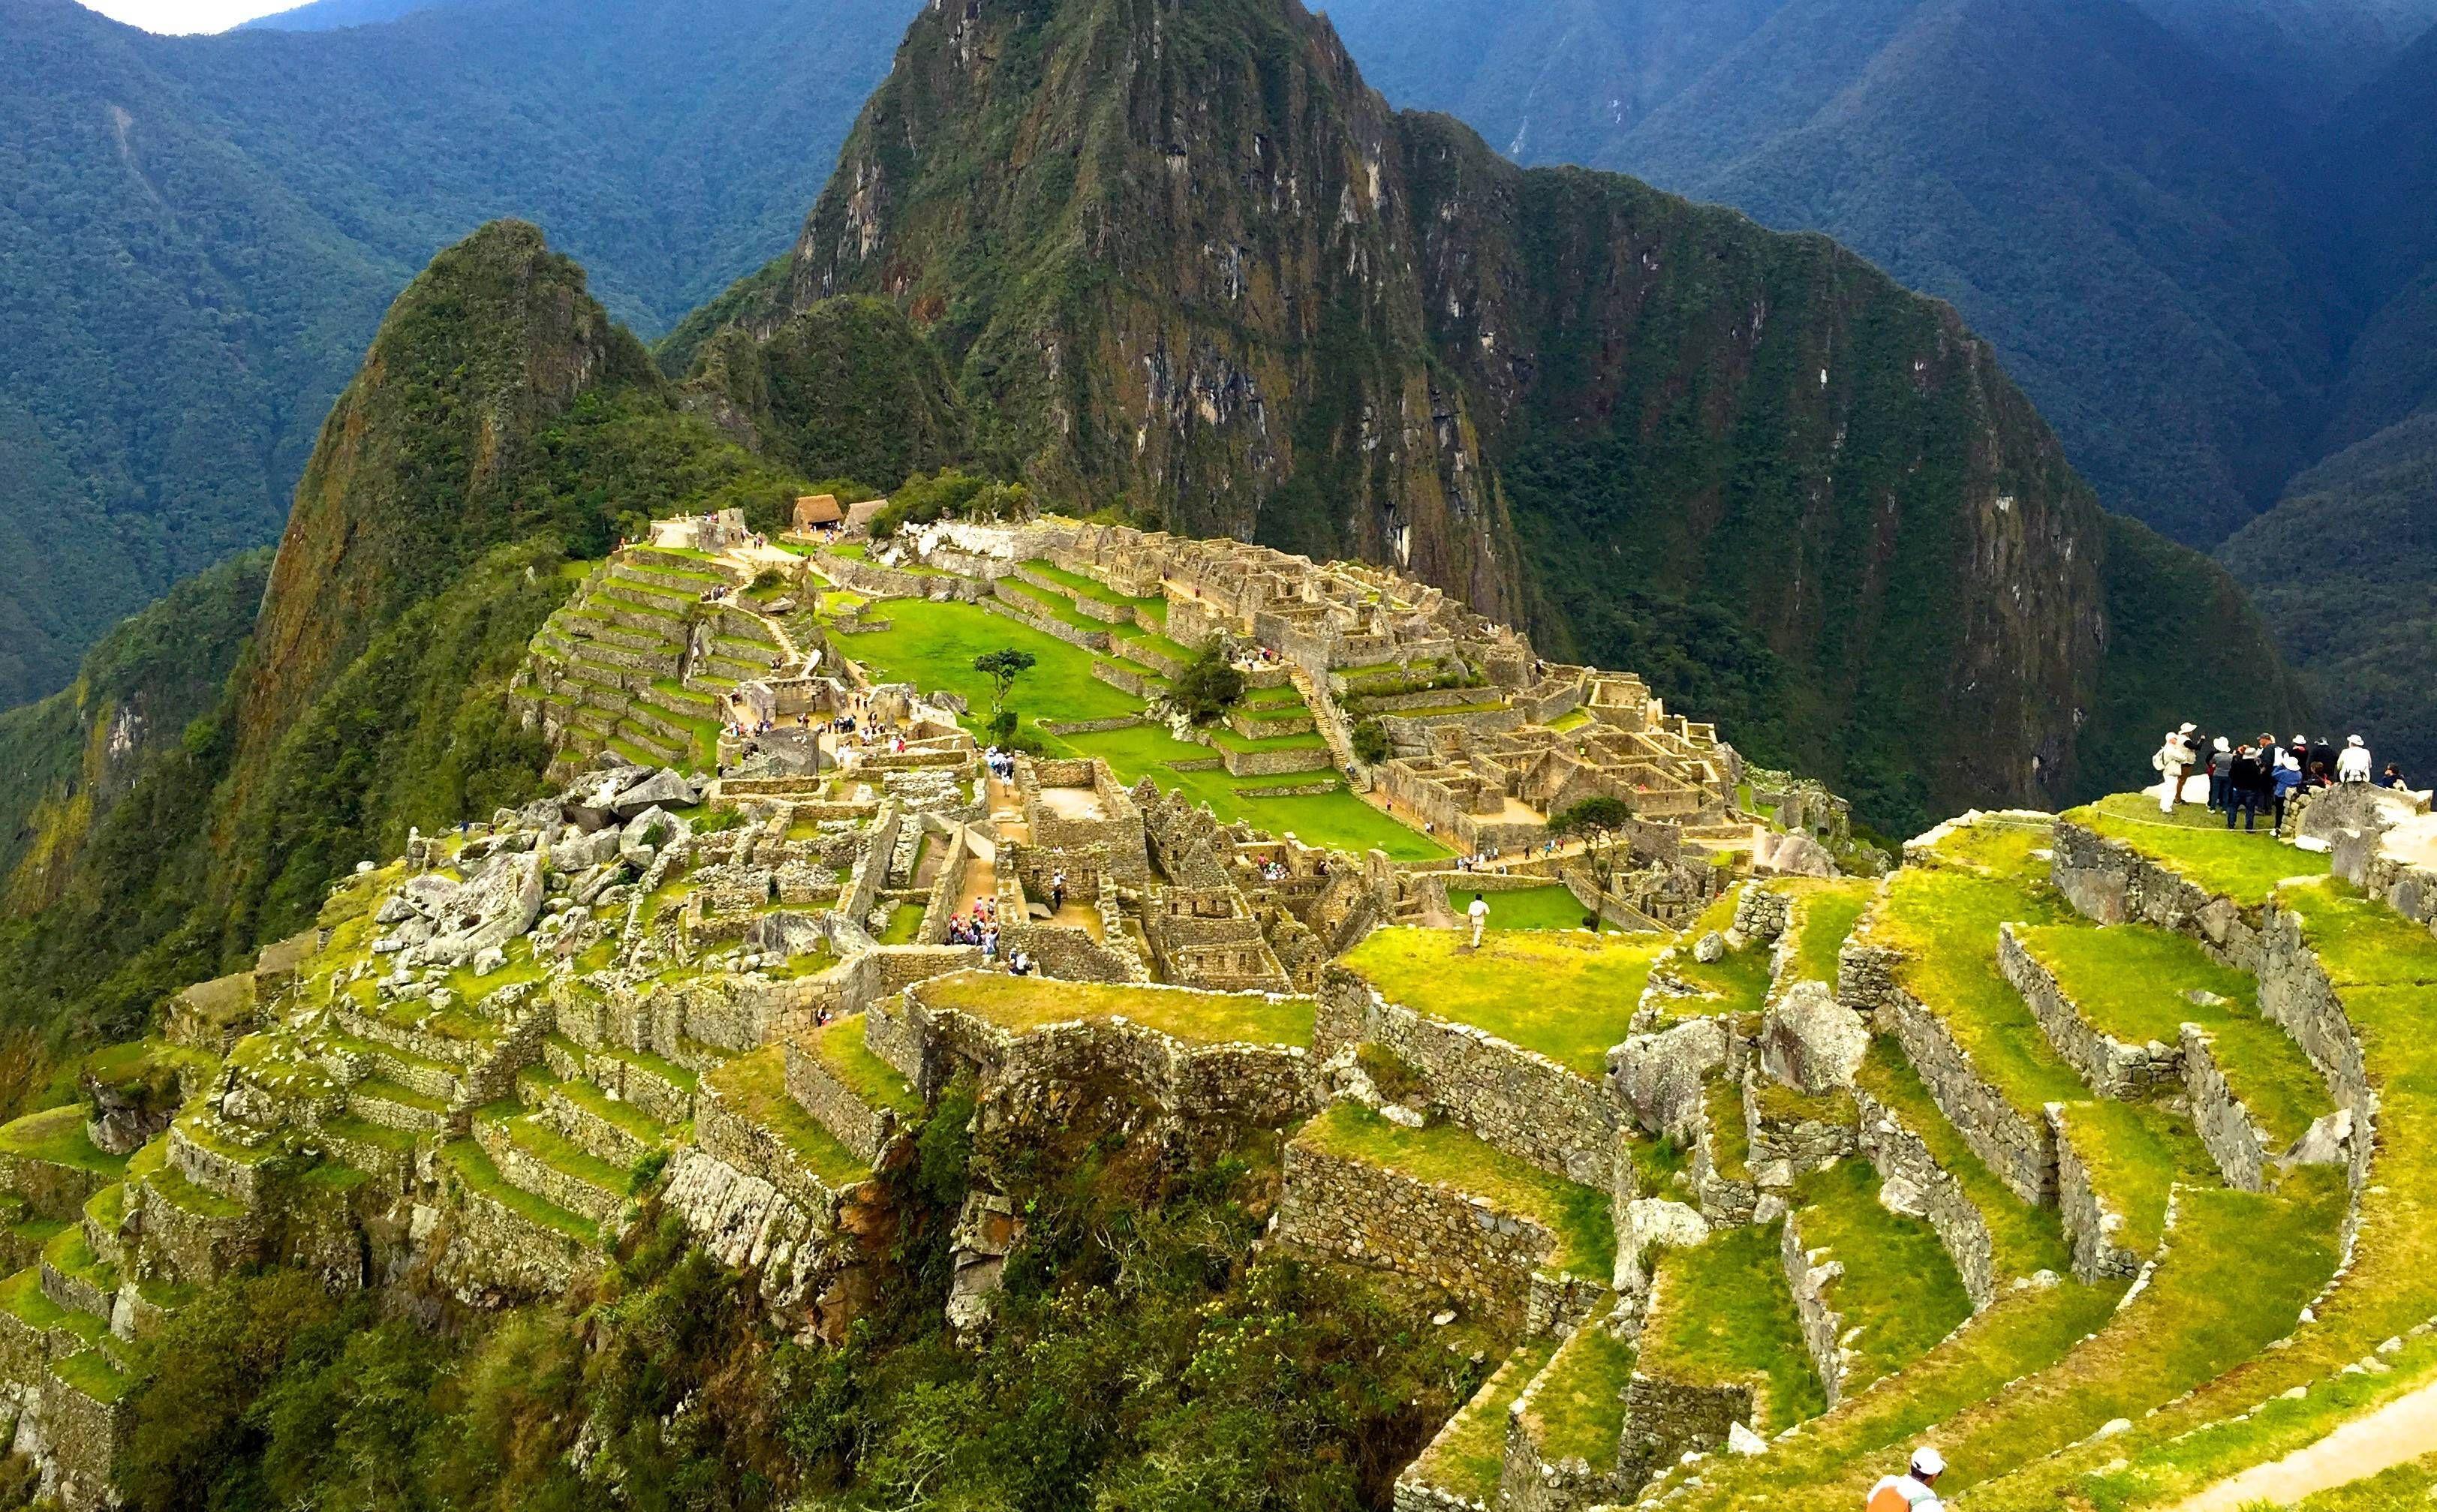 Visitando o Vale Sagrado e Machu Picchu